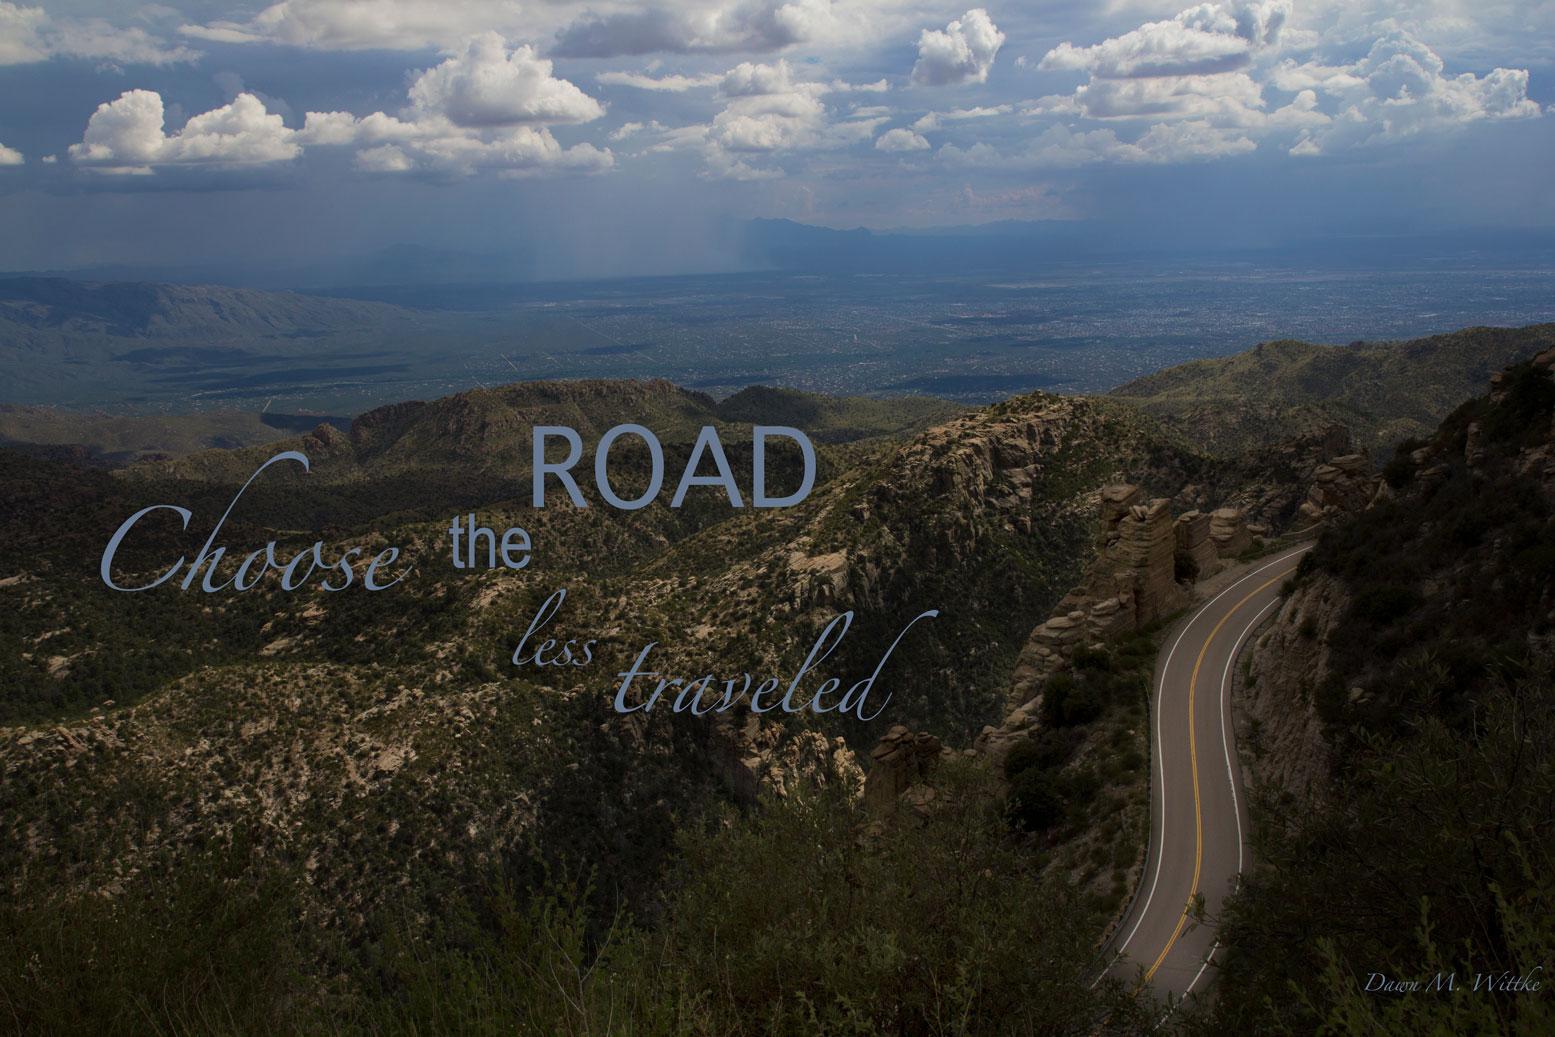 Road Less Traveled    Photo by Dawn M. Wittke    Taken near Mt Lemmon in The Santa Catalina Mountains, Arizona       .      .    .